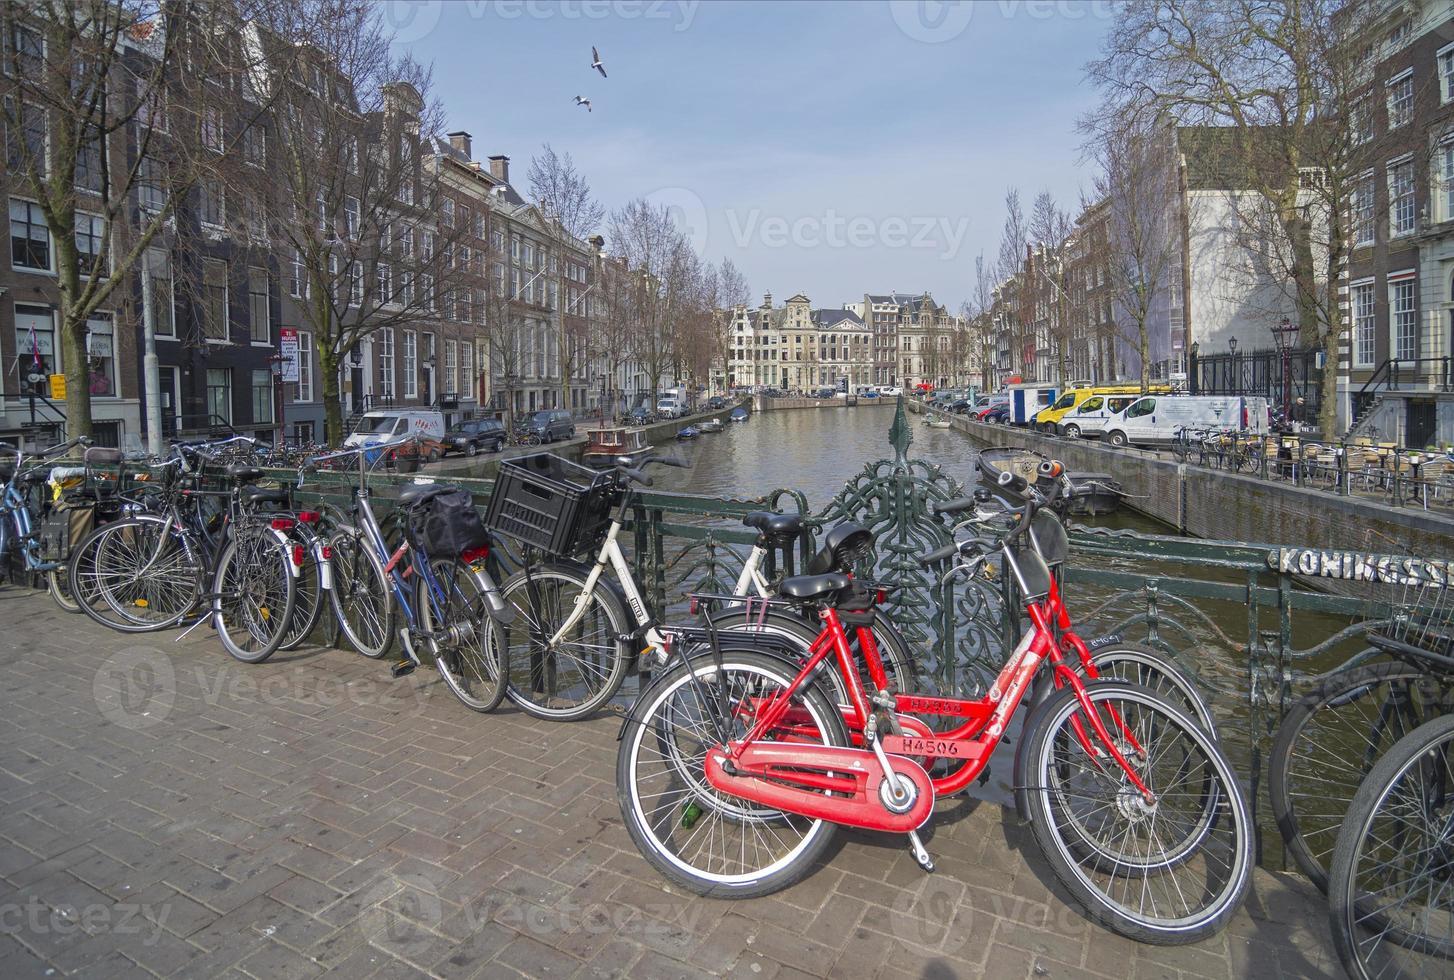 estacionamento de bicicletas no canal, amsterdã. foto